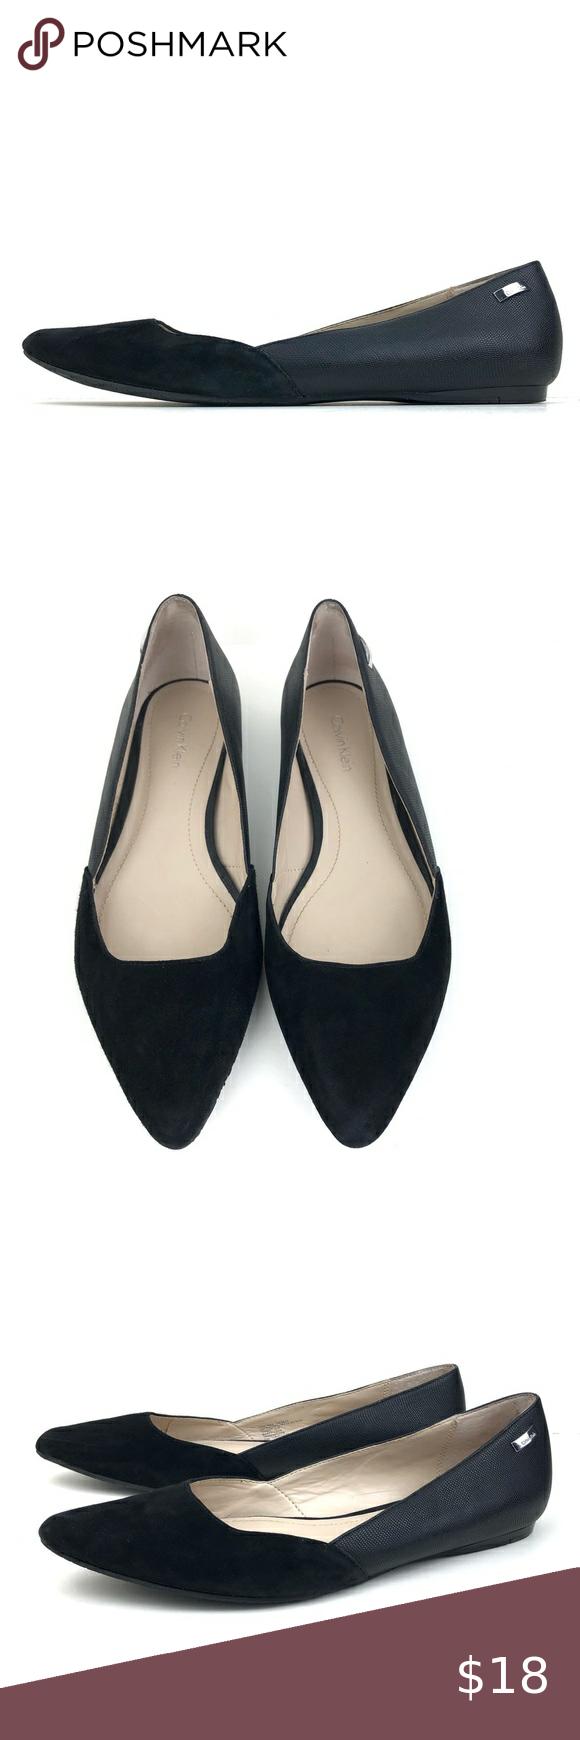 Calvin Klein Hyacinth Pointed Toe Flats